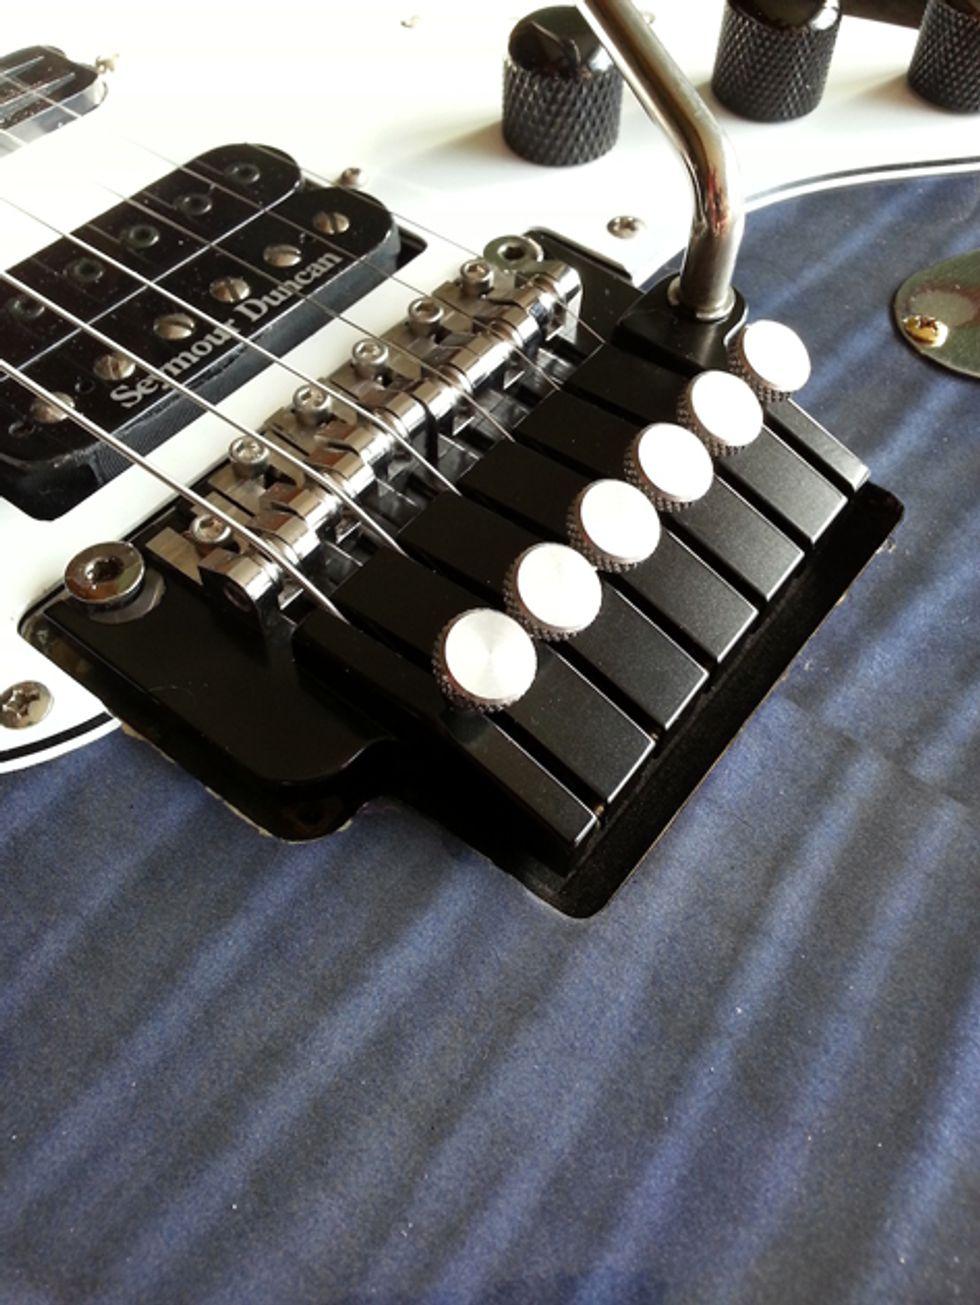 axmax introduces new tremolo system 2013 08 27 premier guitar. Black Bedroom Furniture Sets. Home Design Ideas